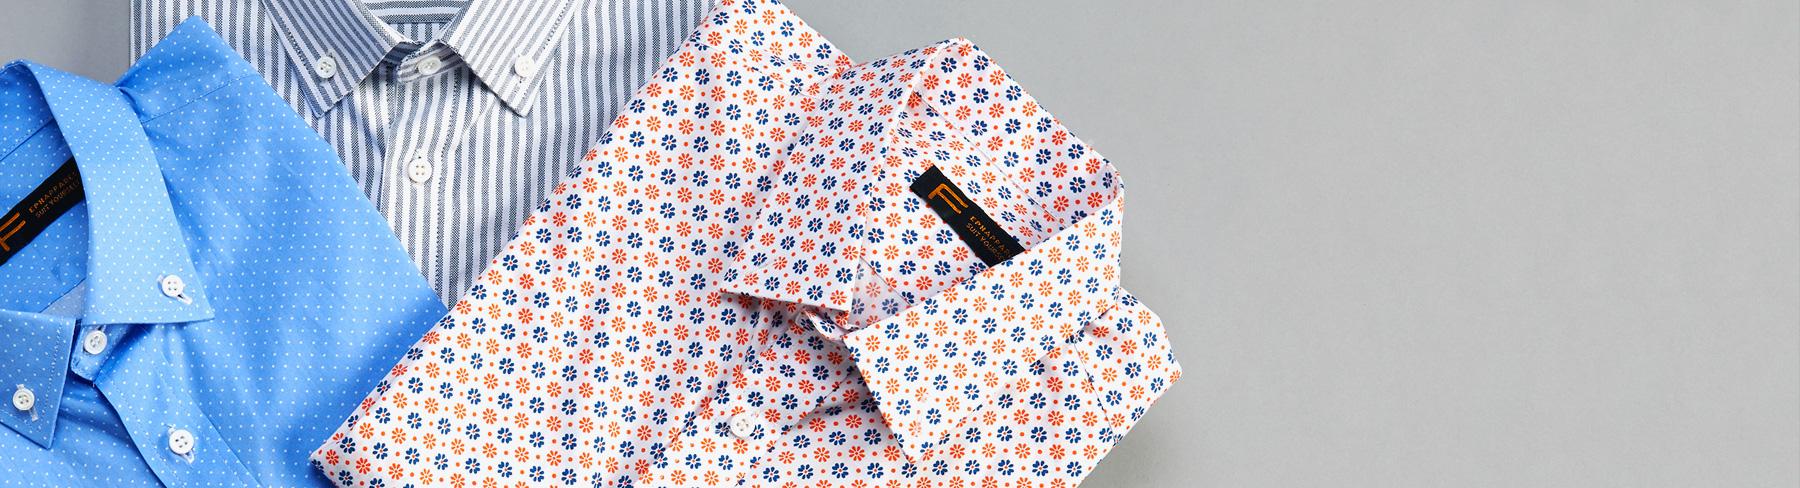 Save on dress shirts